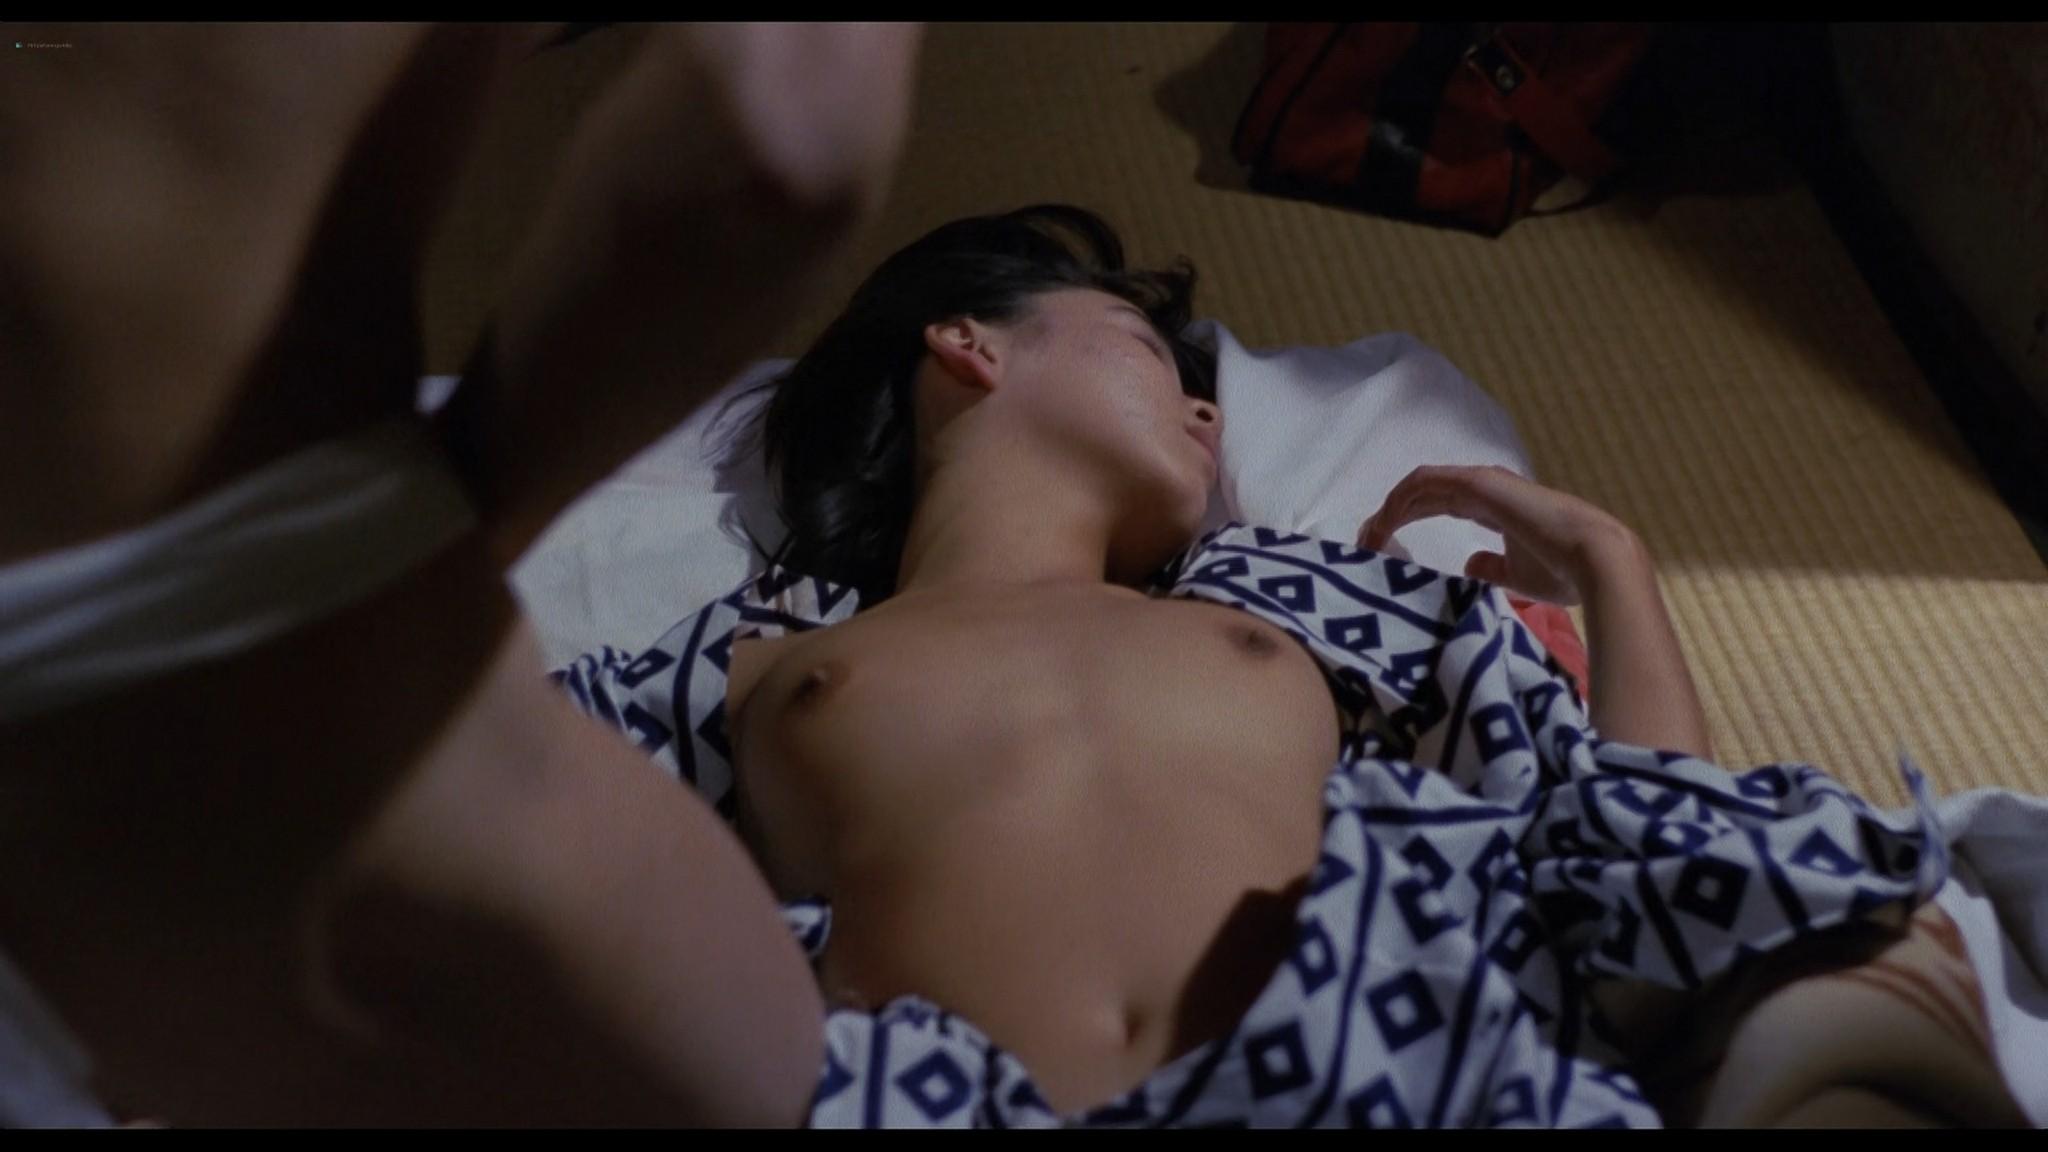 Natsuko Yamamoto nude Kaoru Oda nude lot of sex Beautiful Wrestlers Down for the Count JP 1984 1080p BluRay REMUX 20